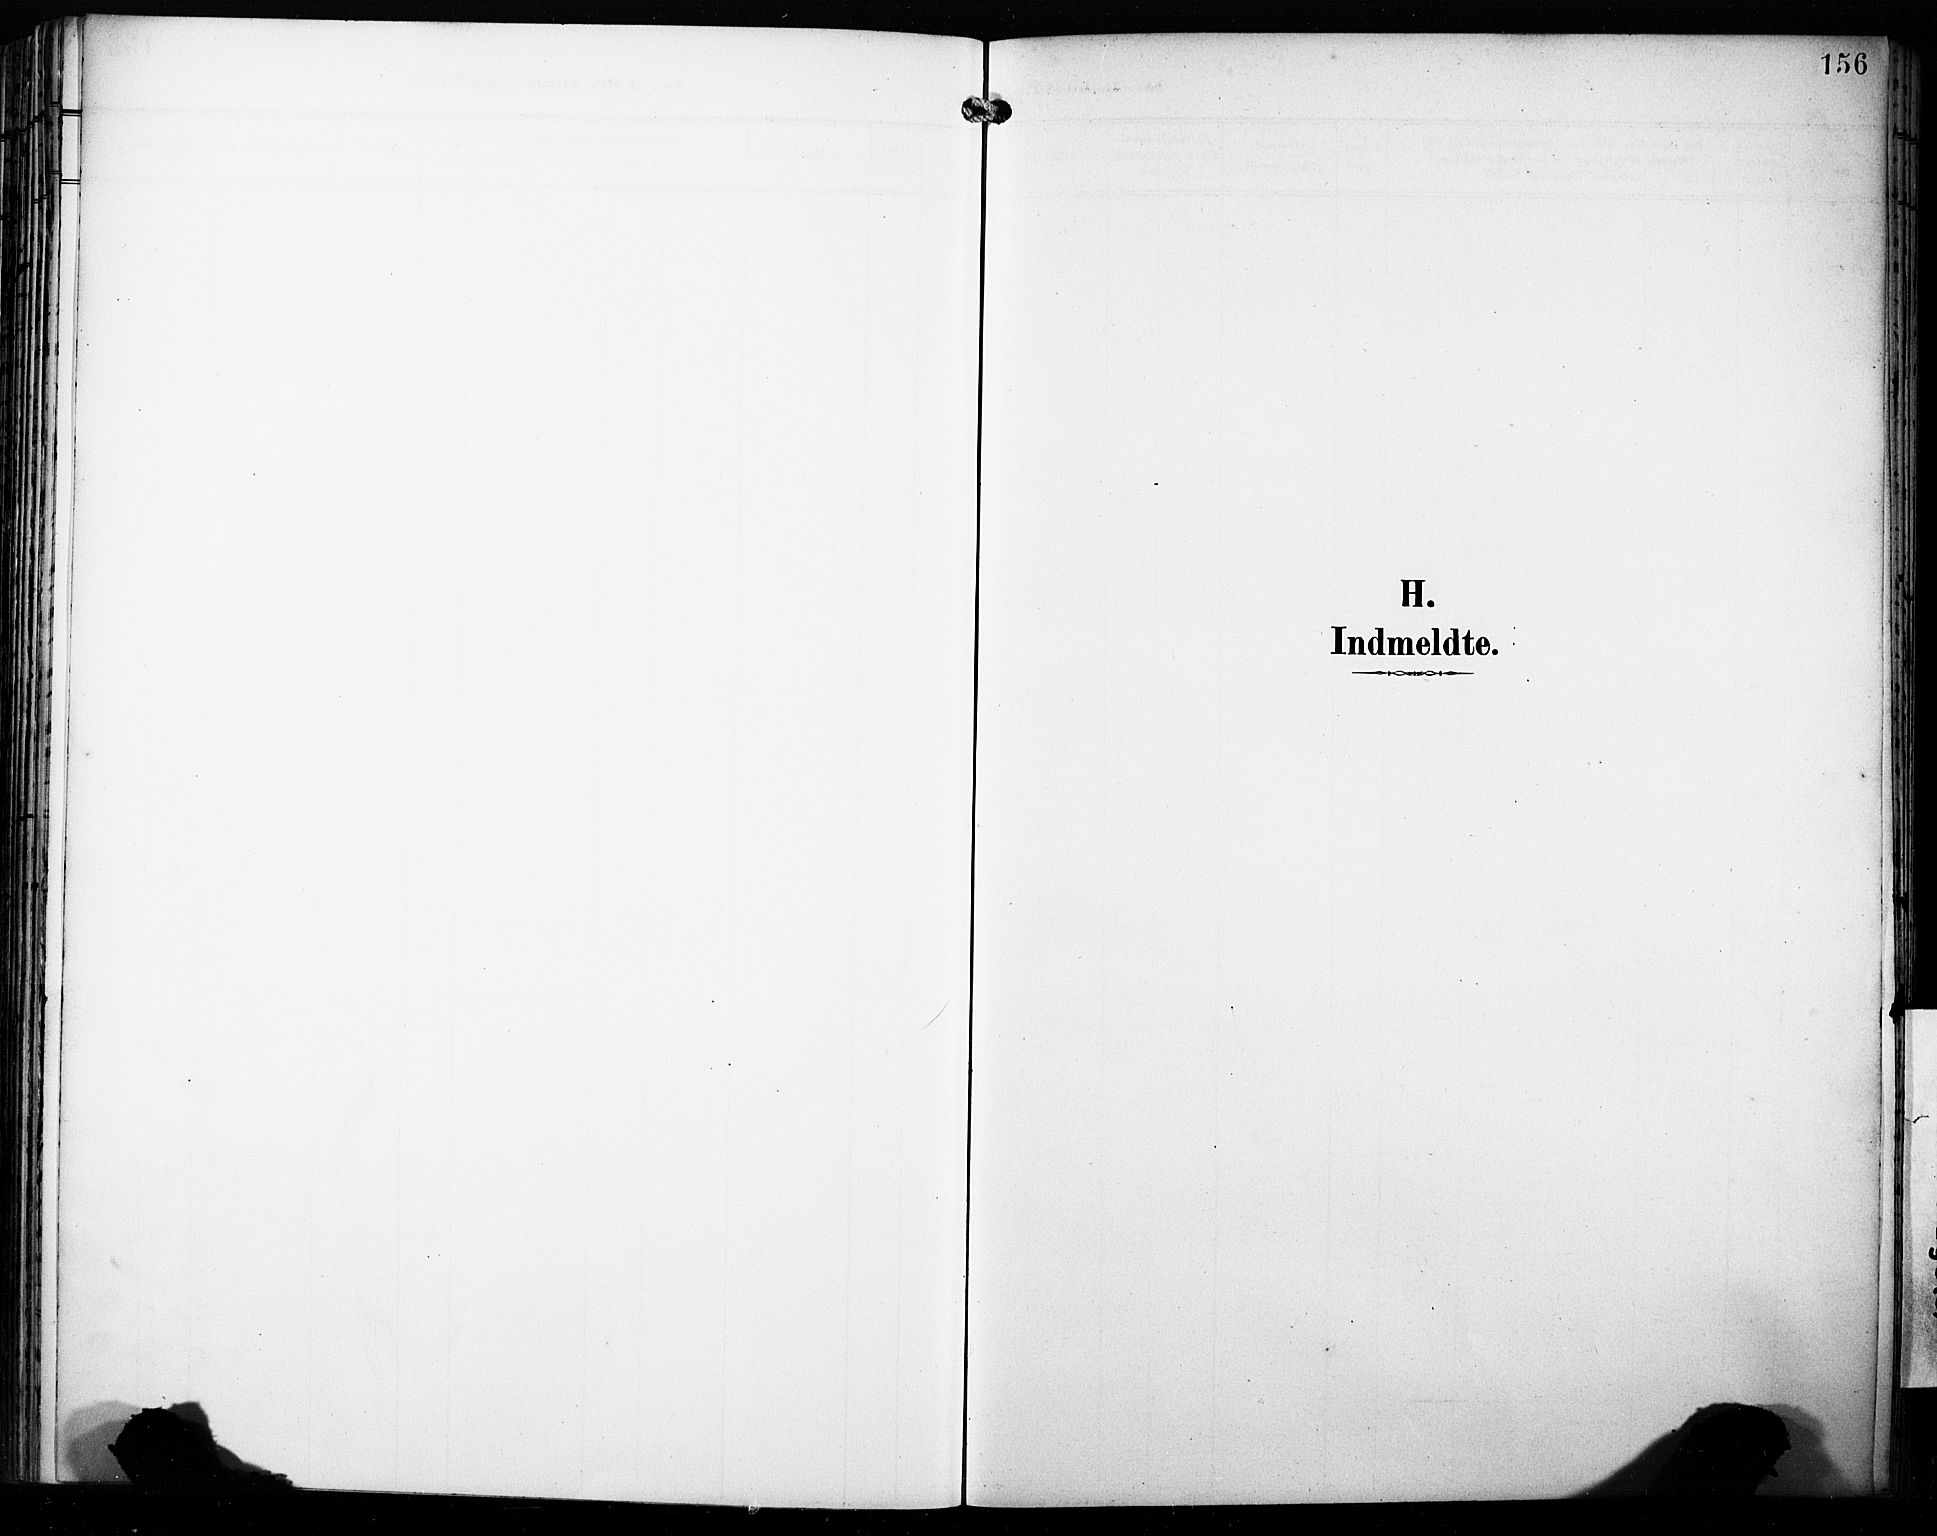 SAB, Fana Sokneprestembete, H/Haa/Haab/L0003: Ministerialbok nr. B 3, 1898-1907, s. 156